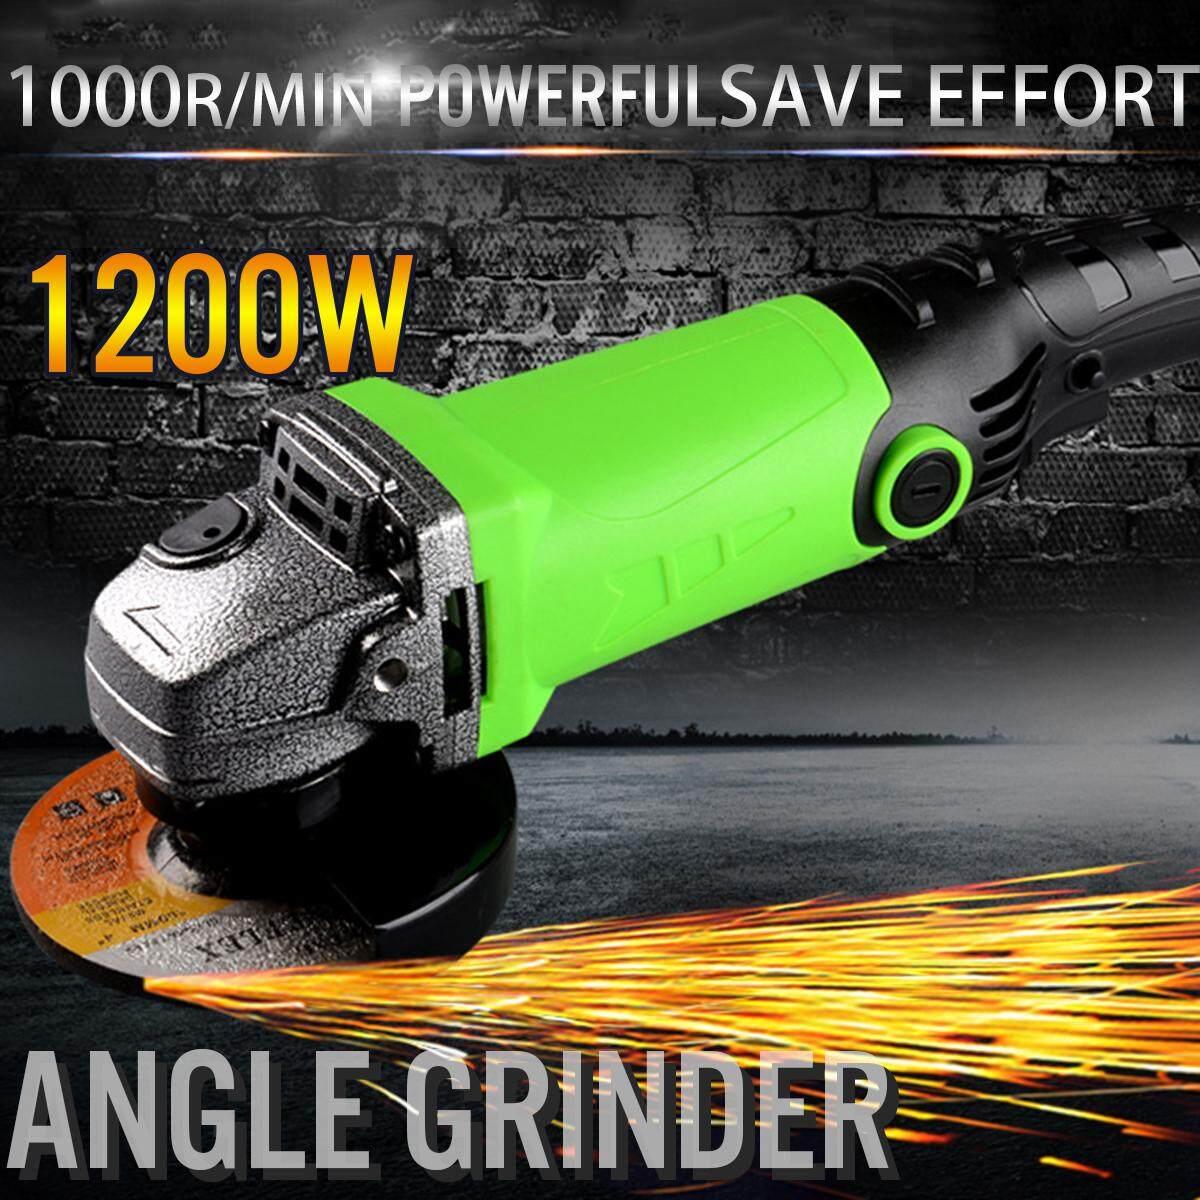 MOD.5107 1200W Multi-function  Angle Grinder Cutting Polishing